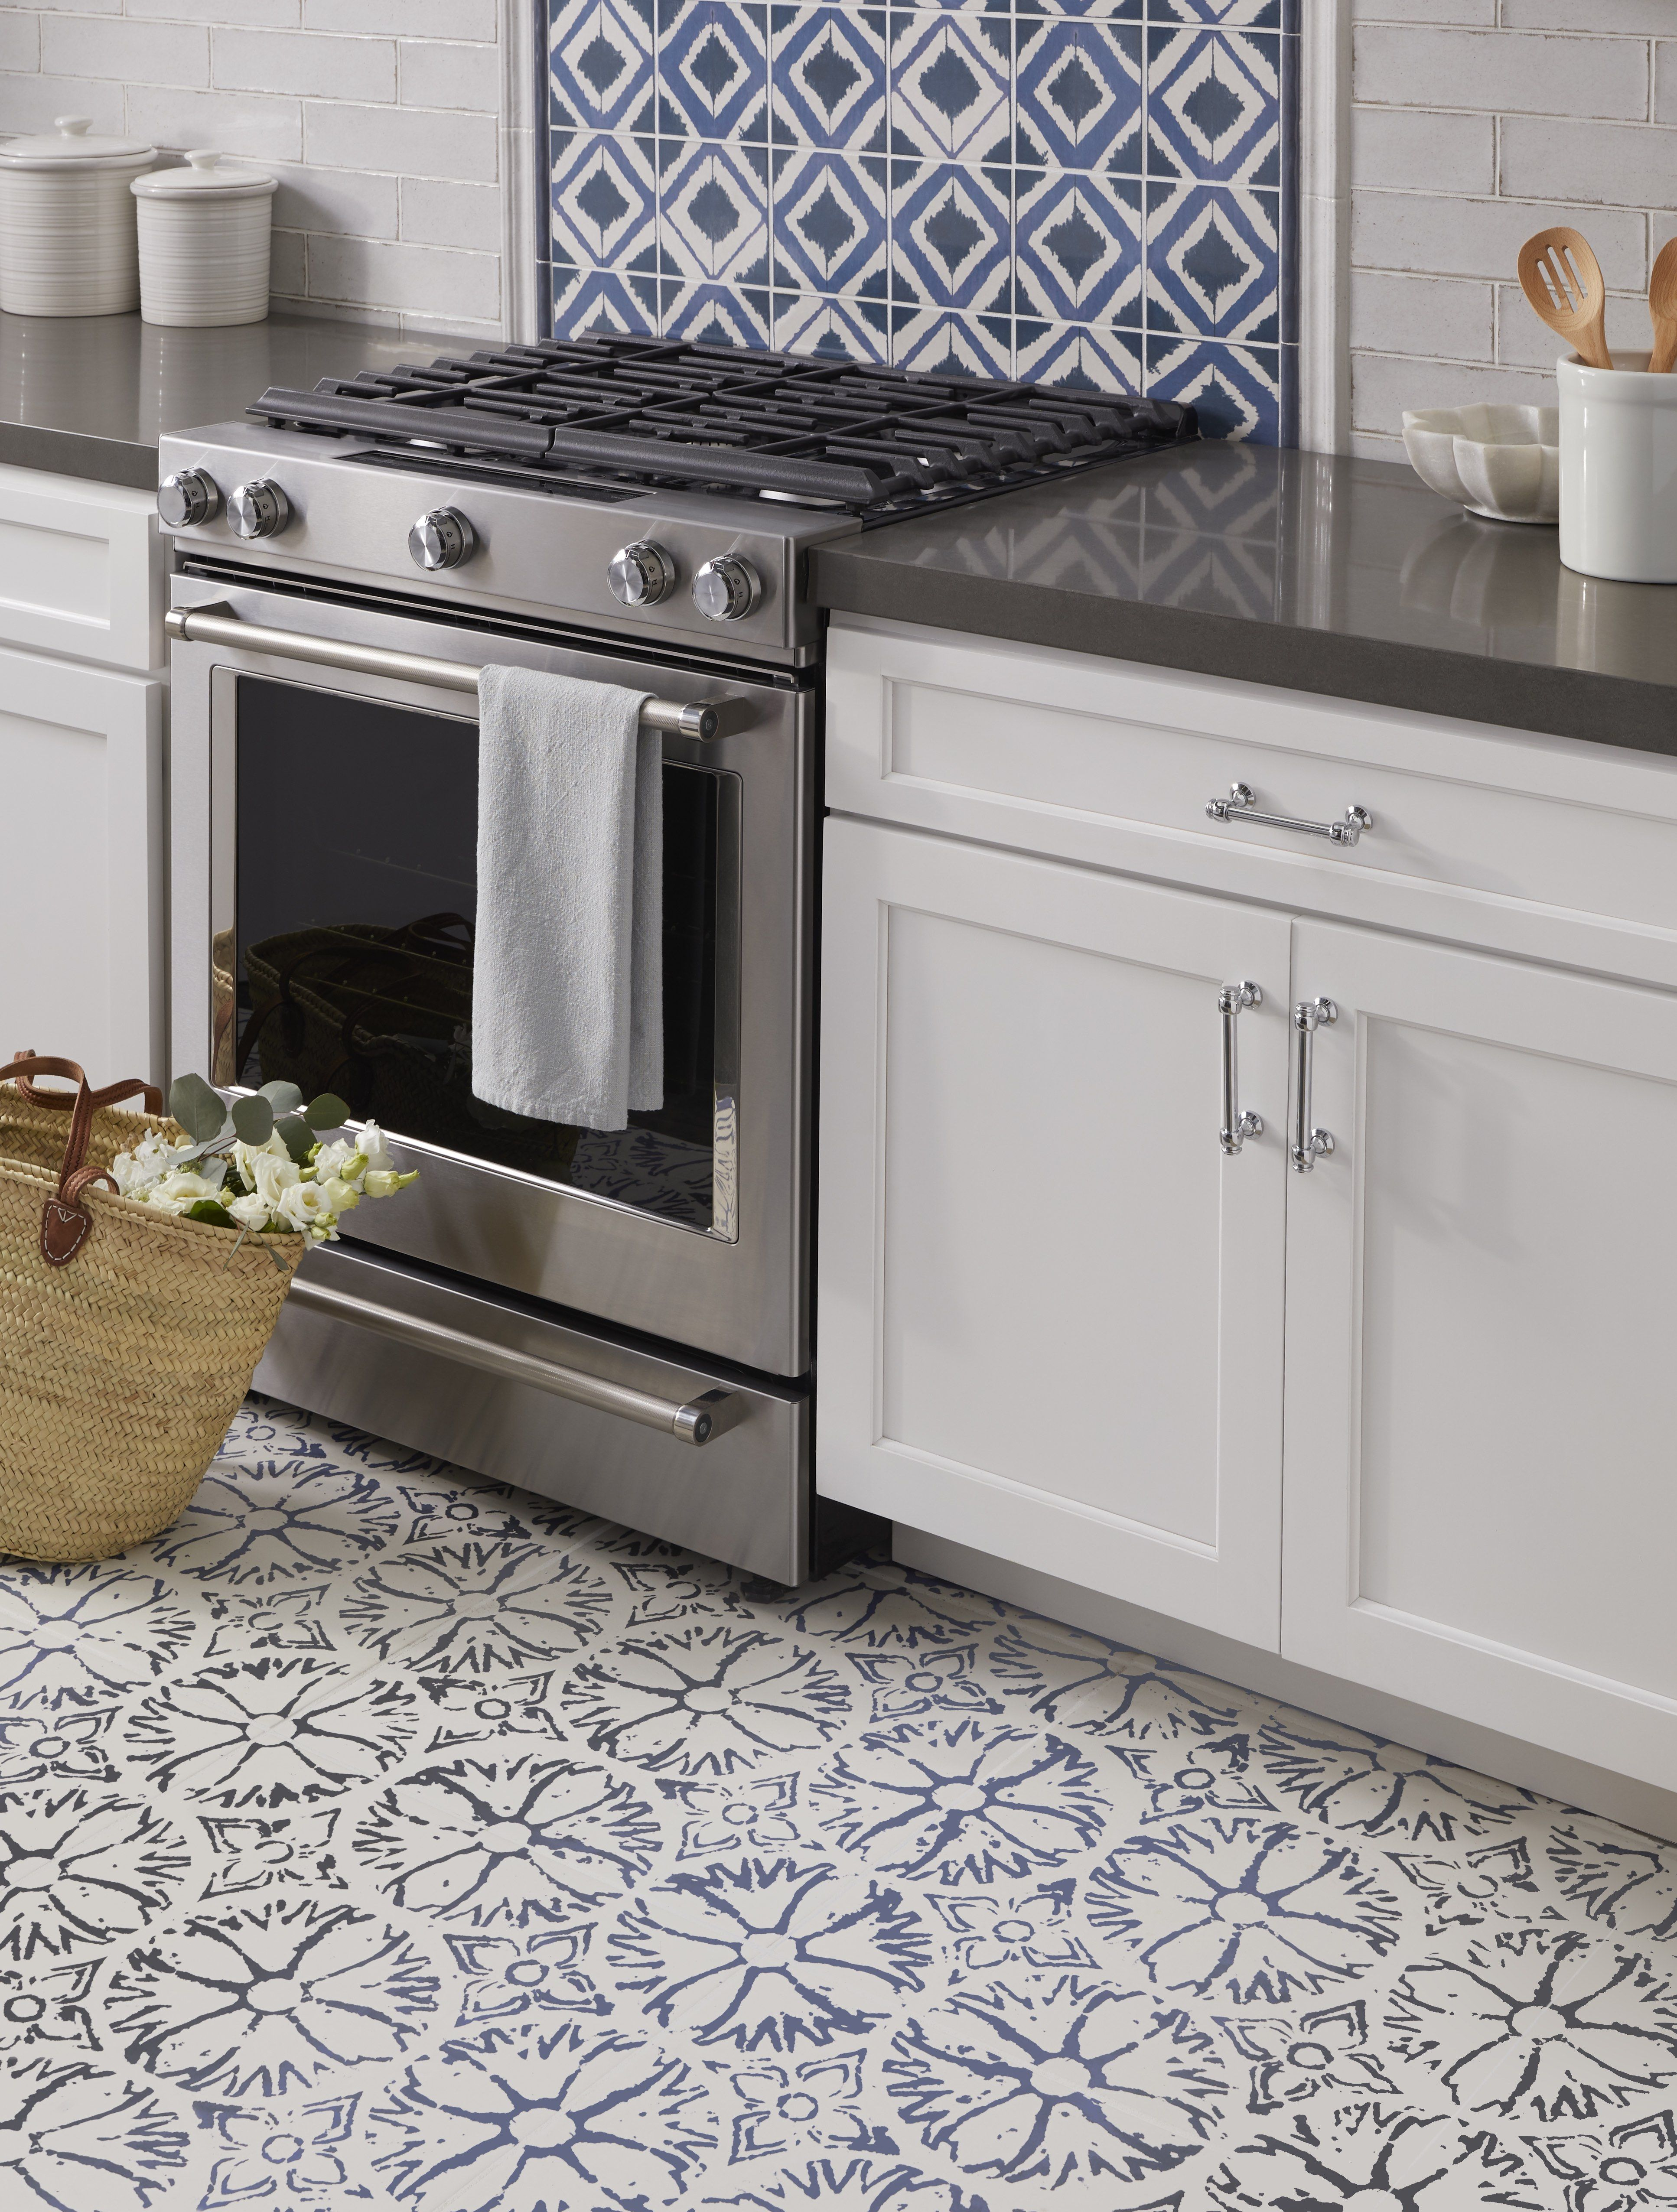 Inspired By Vintage Block Prints Annie Selke Aylin Has A Handmade Printed Linen Look Which Brings An Artisa Kitchen Flooring Kitchen Floor Tile Ceramic Floor